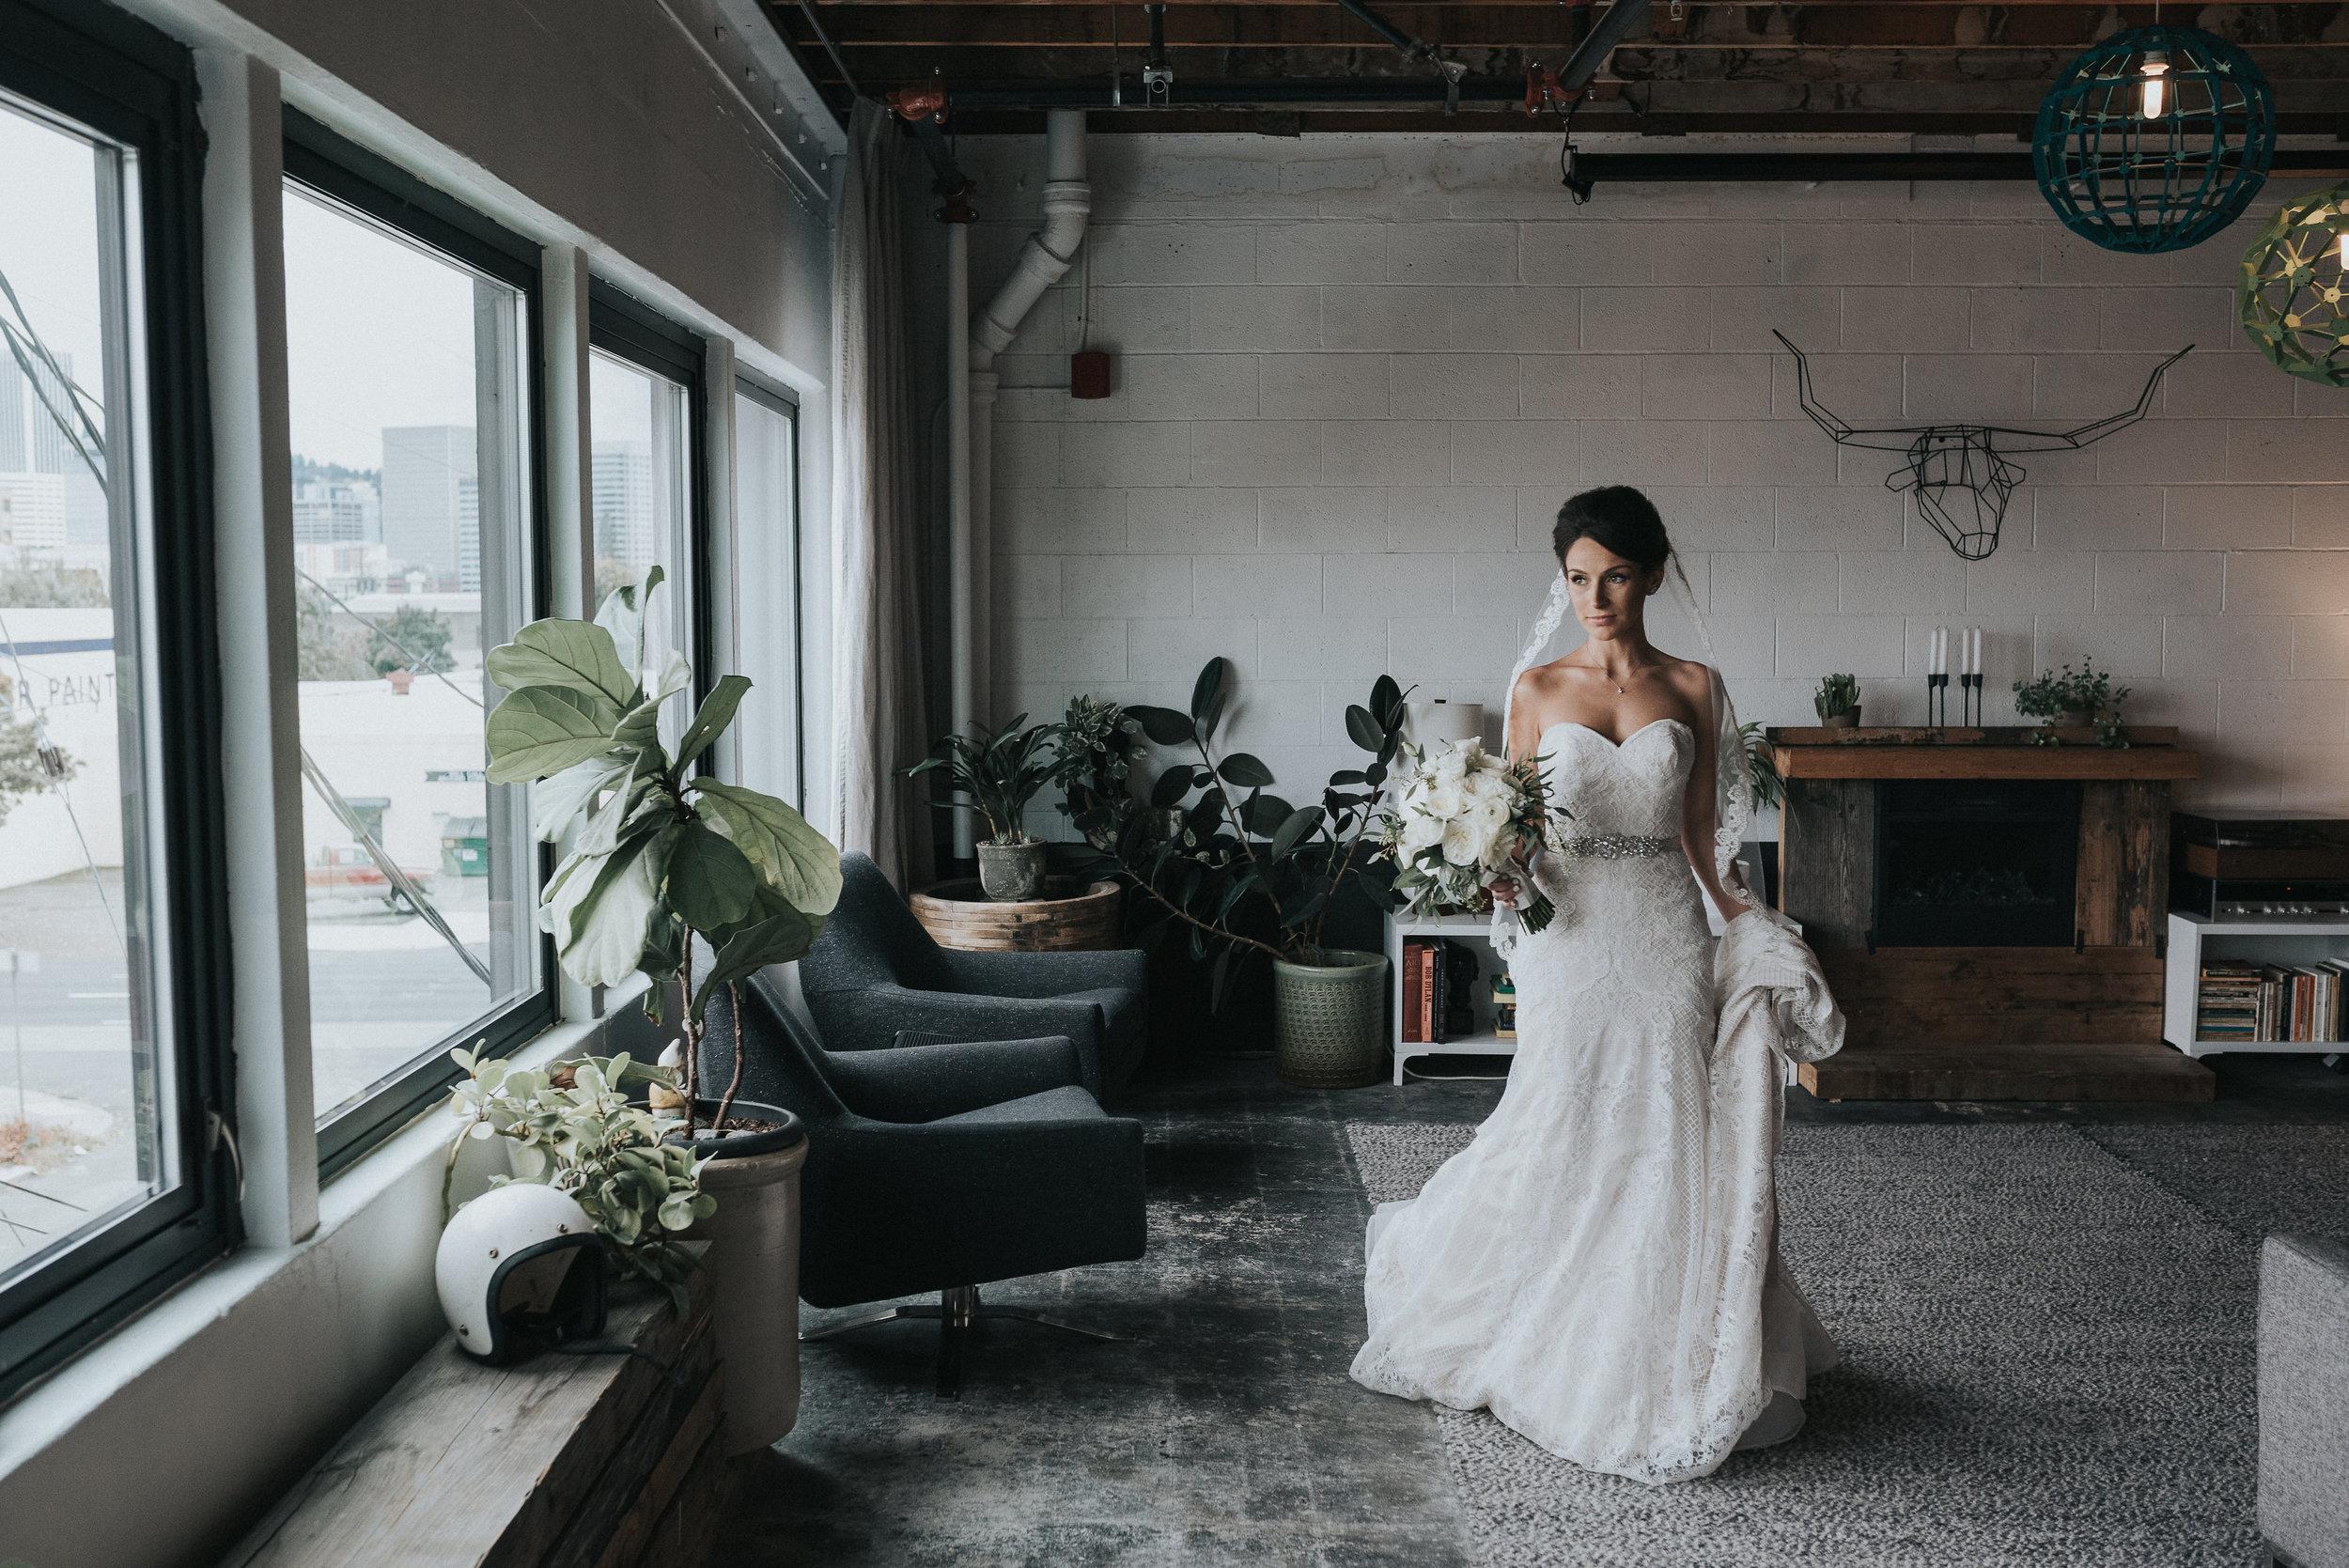 portland-wedding-venue-26.jpg